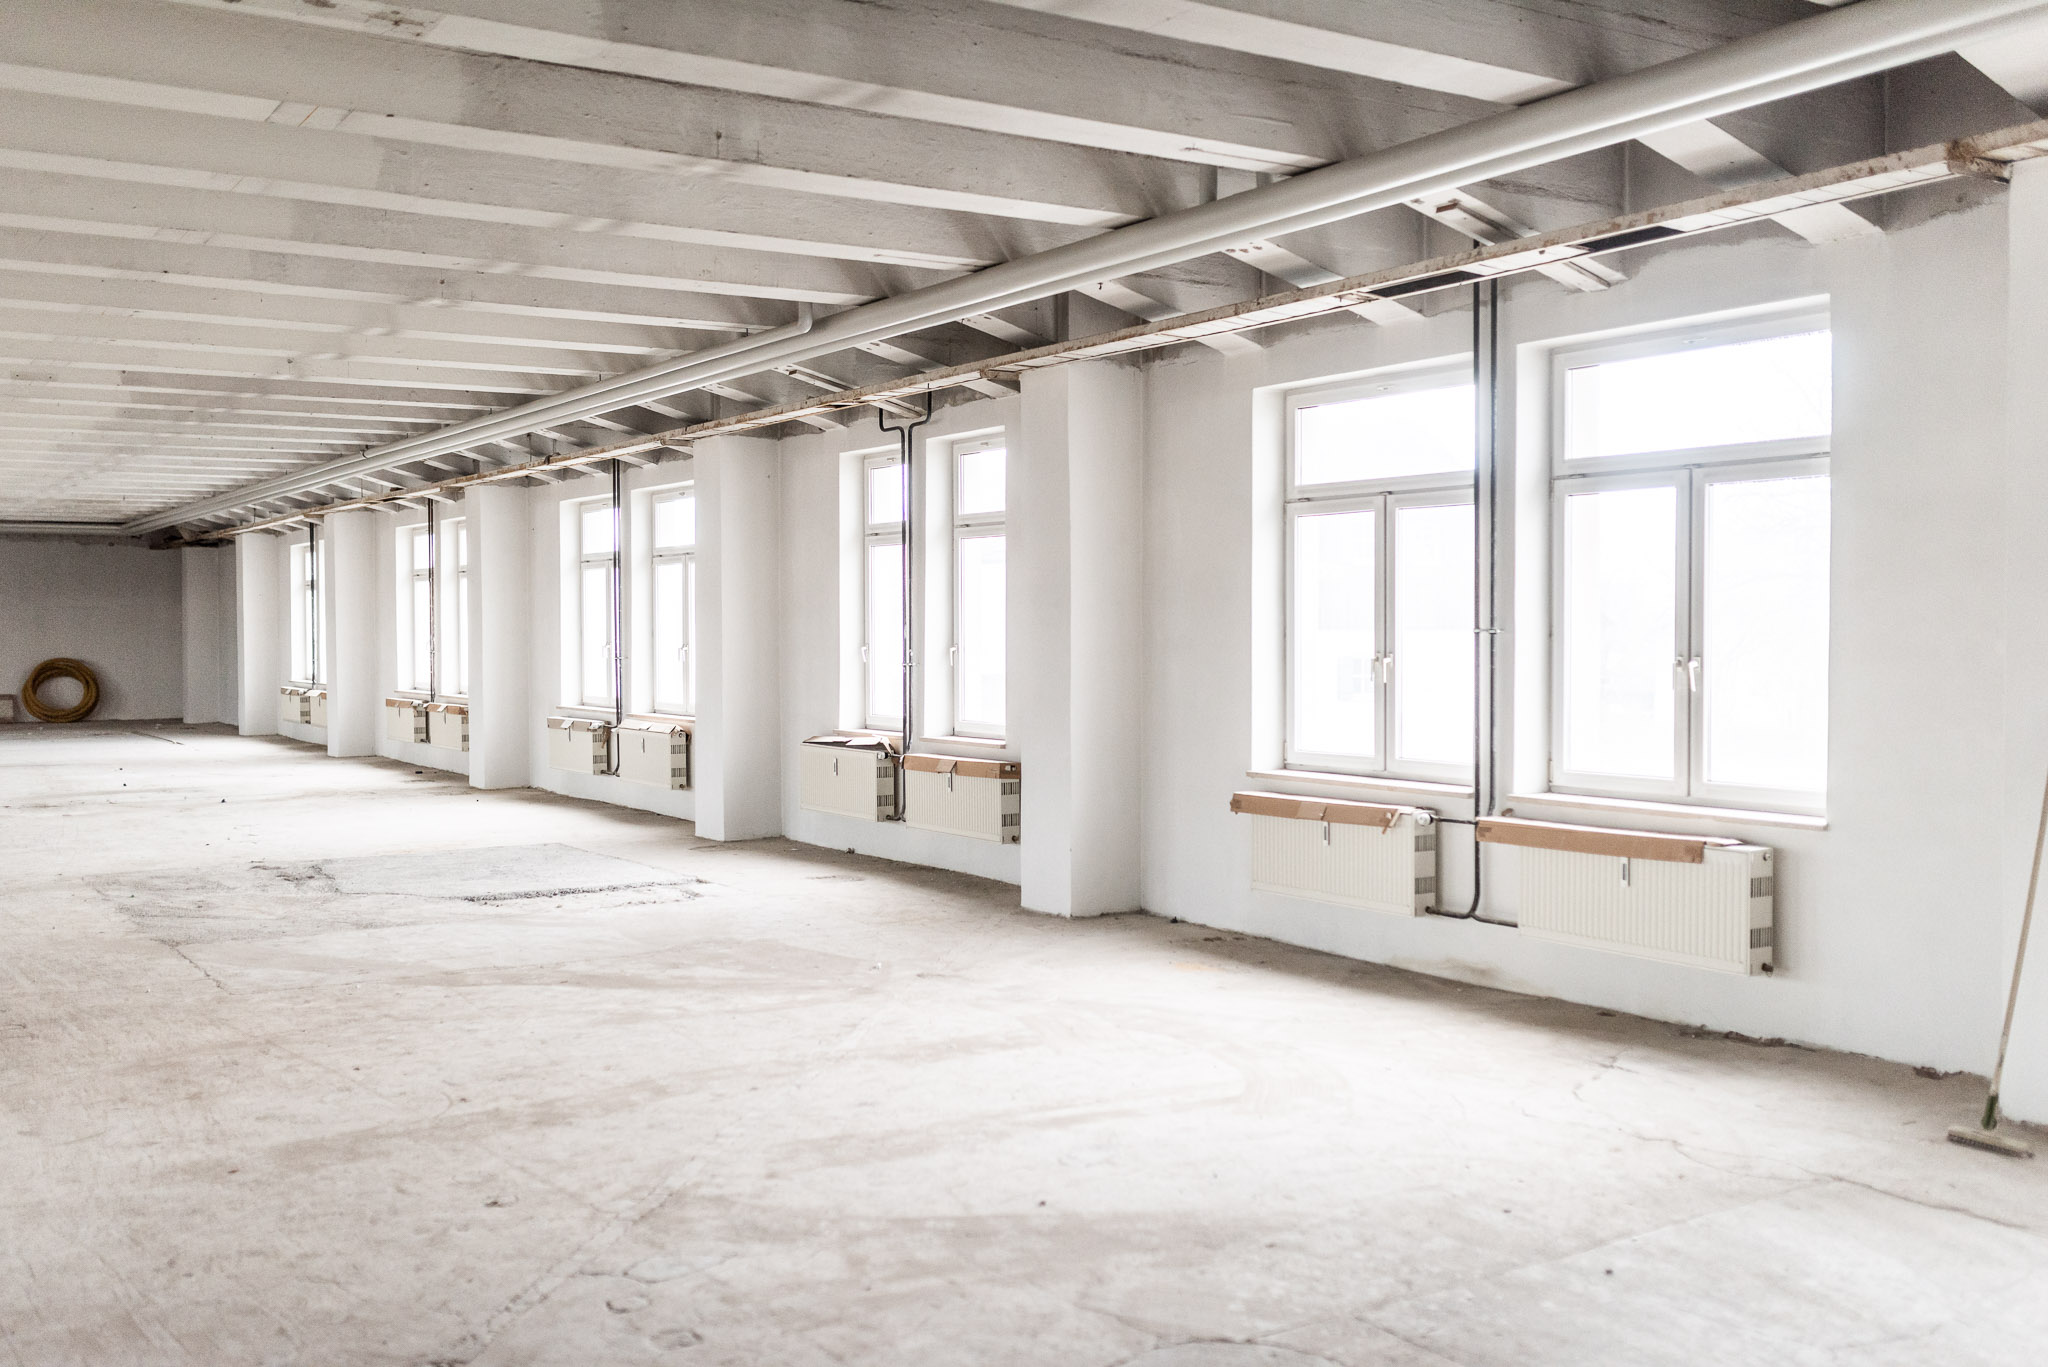 gewerbe lager büro wup-wolldeckenfabrik-1056